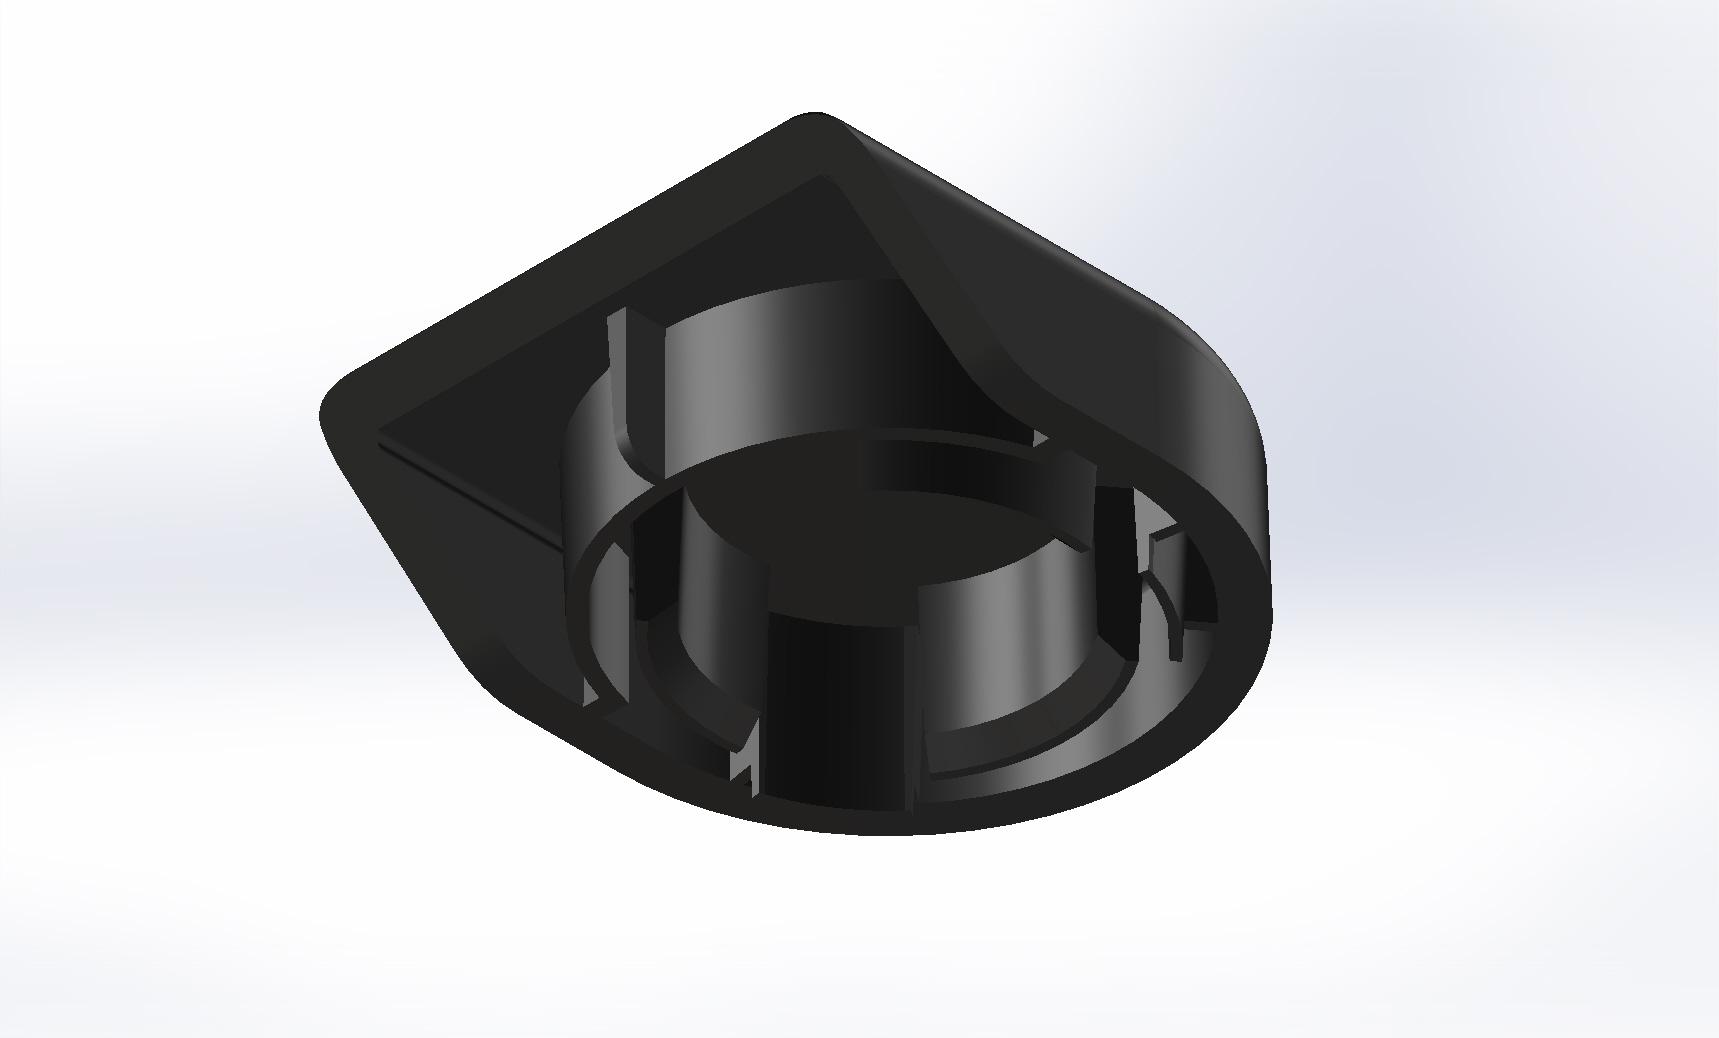 3D-tulostusmalli (varaosa autoon)